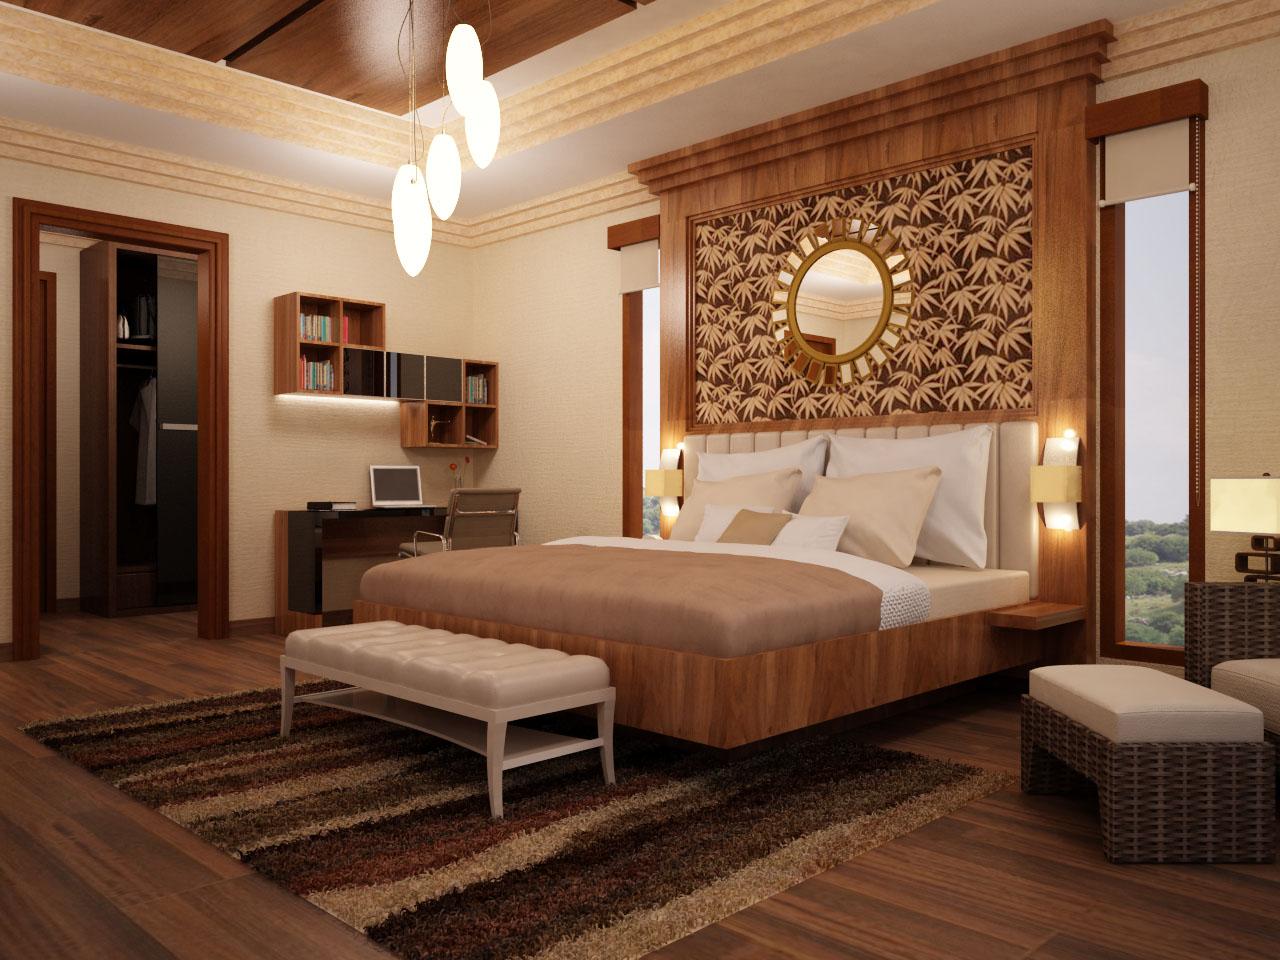 Batam-Bedroom-1.jpg